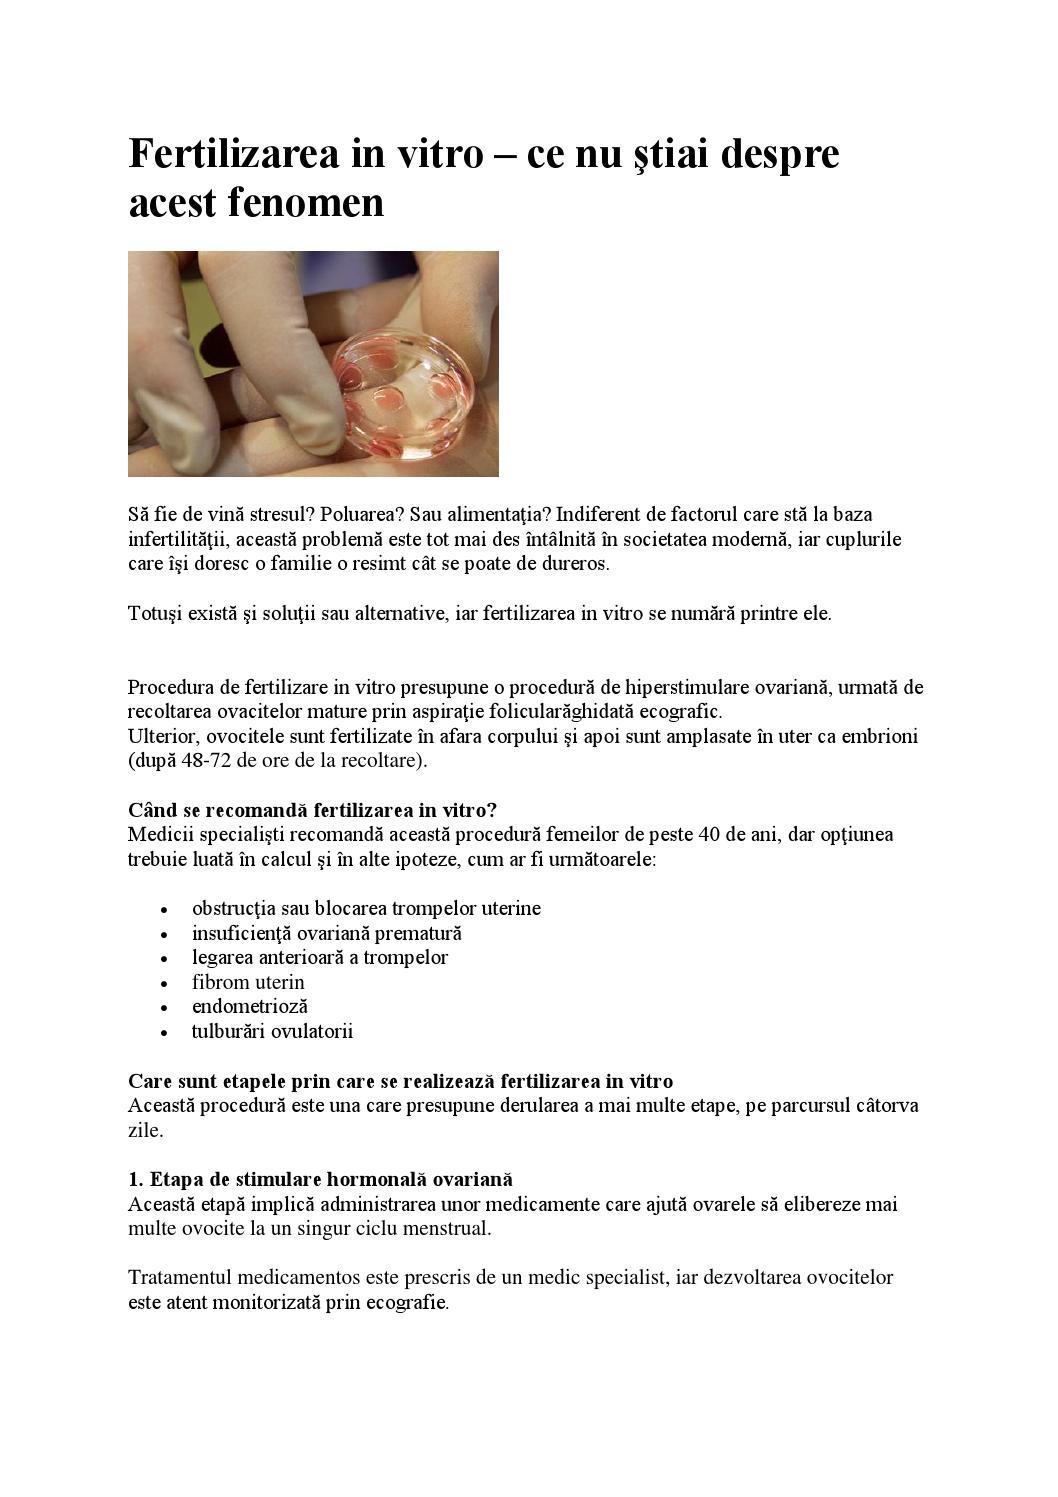 ÎNTREBĂRI FRECVENTE PRIVITOARE LA FIV | Medimall - Fertility Clinic - Greece